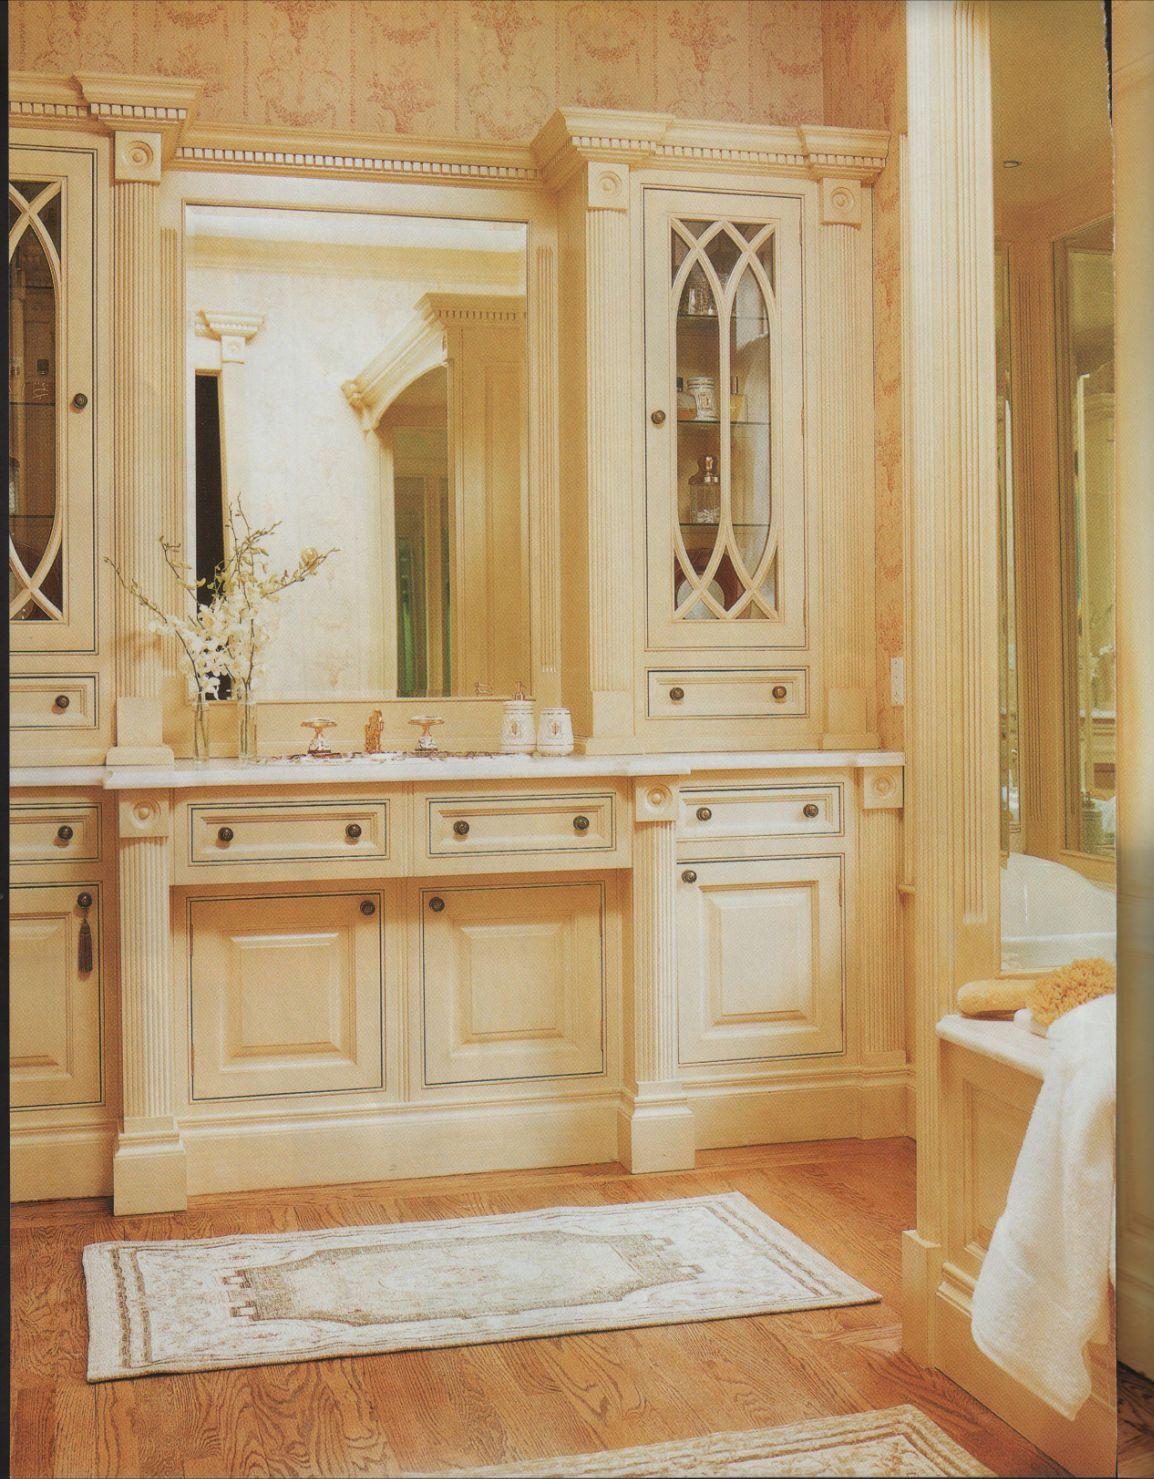 Traditional Home Master bathroom vanity